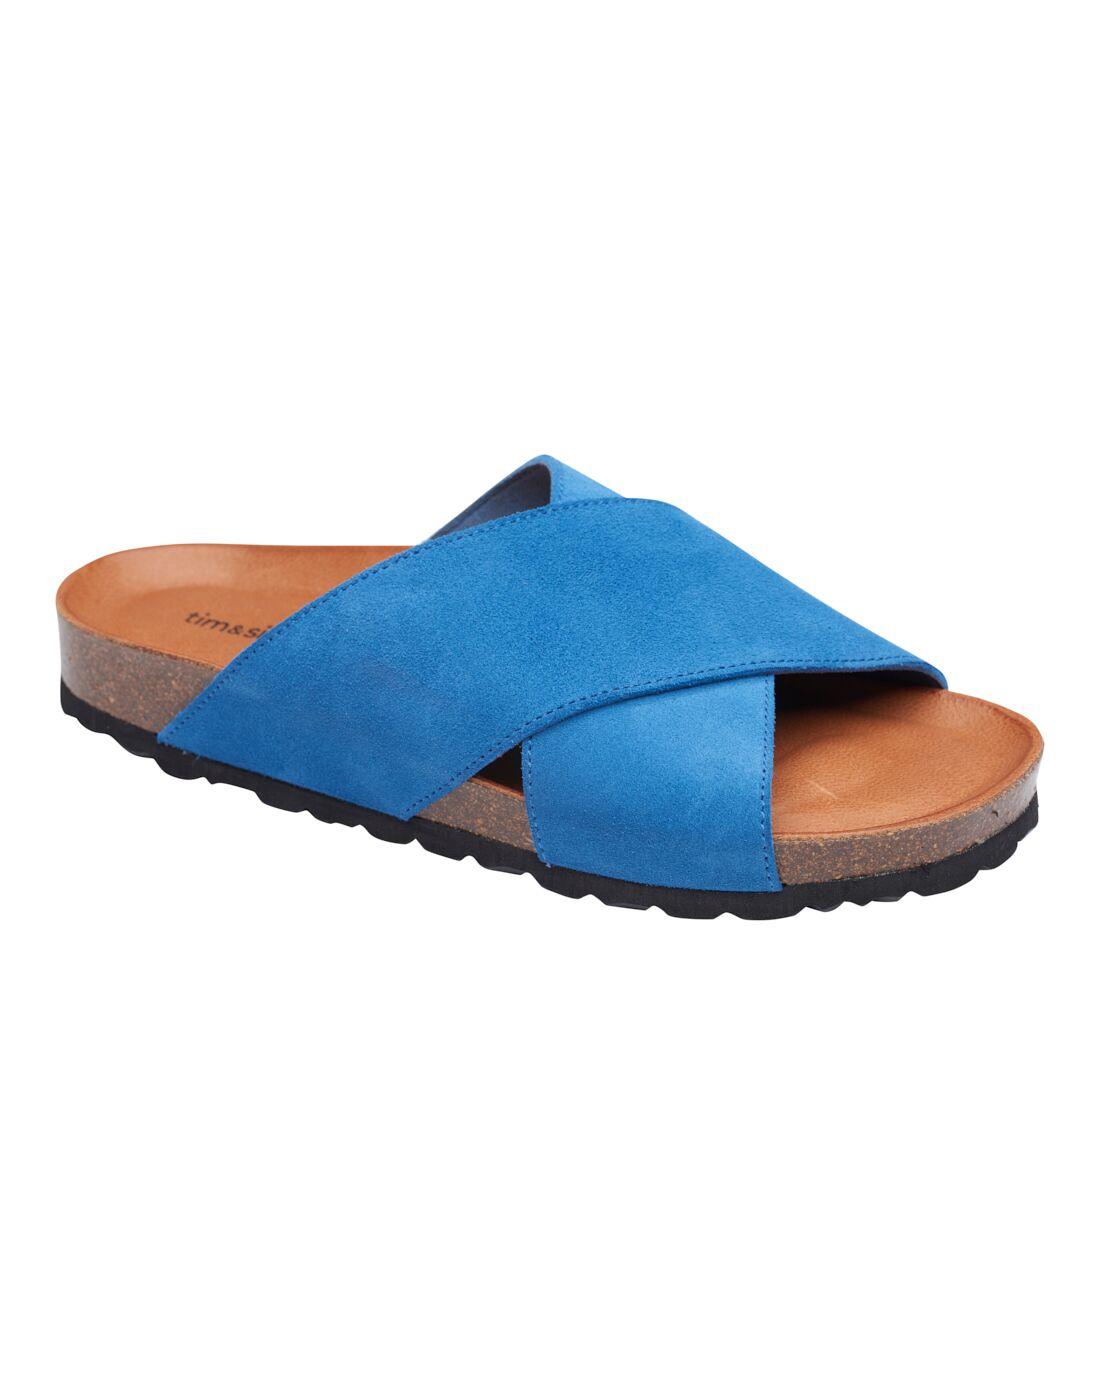 Annet Blue